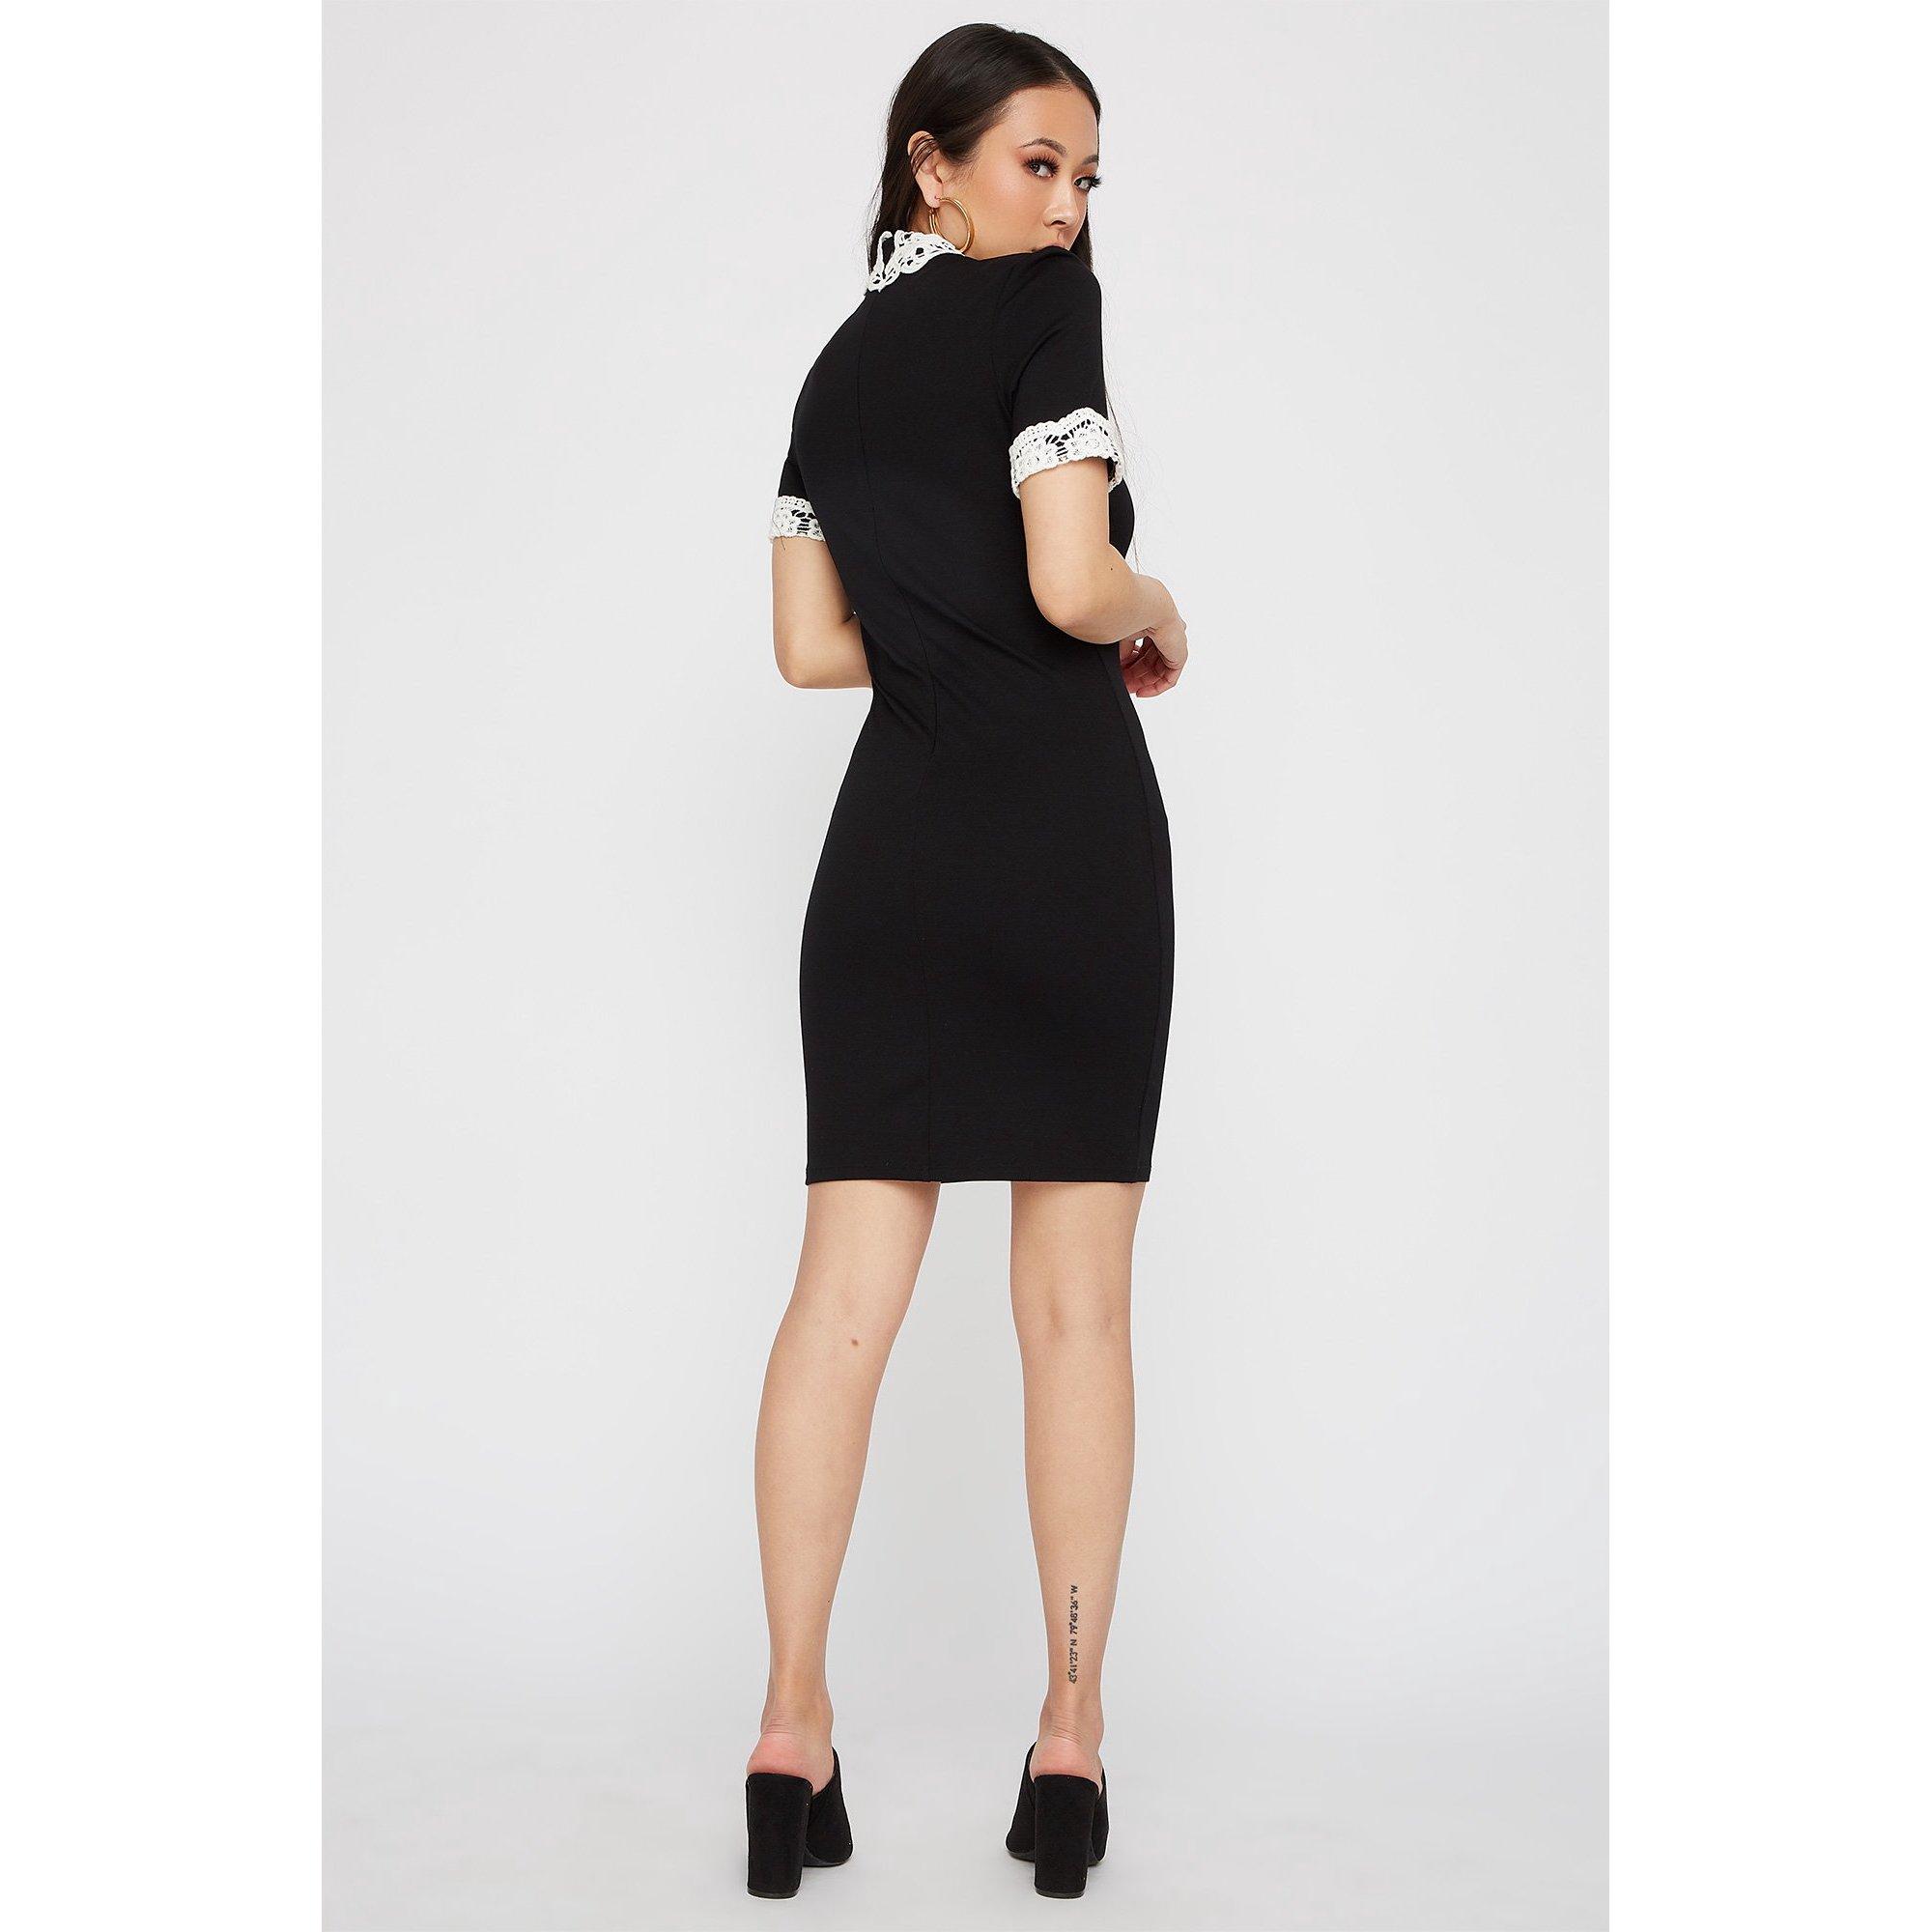 0504ba5f75e7 Black Lace Short Sleeve Mini Dress - raveitsafe